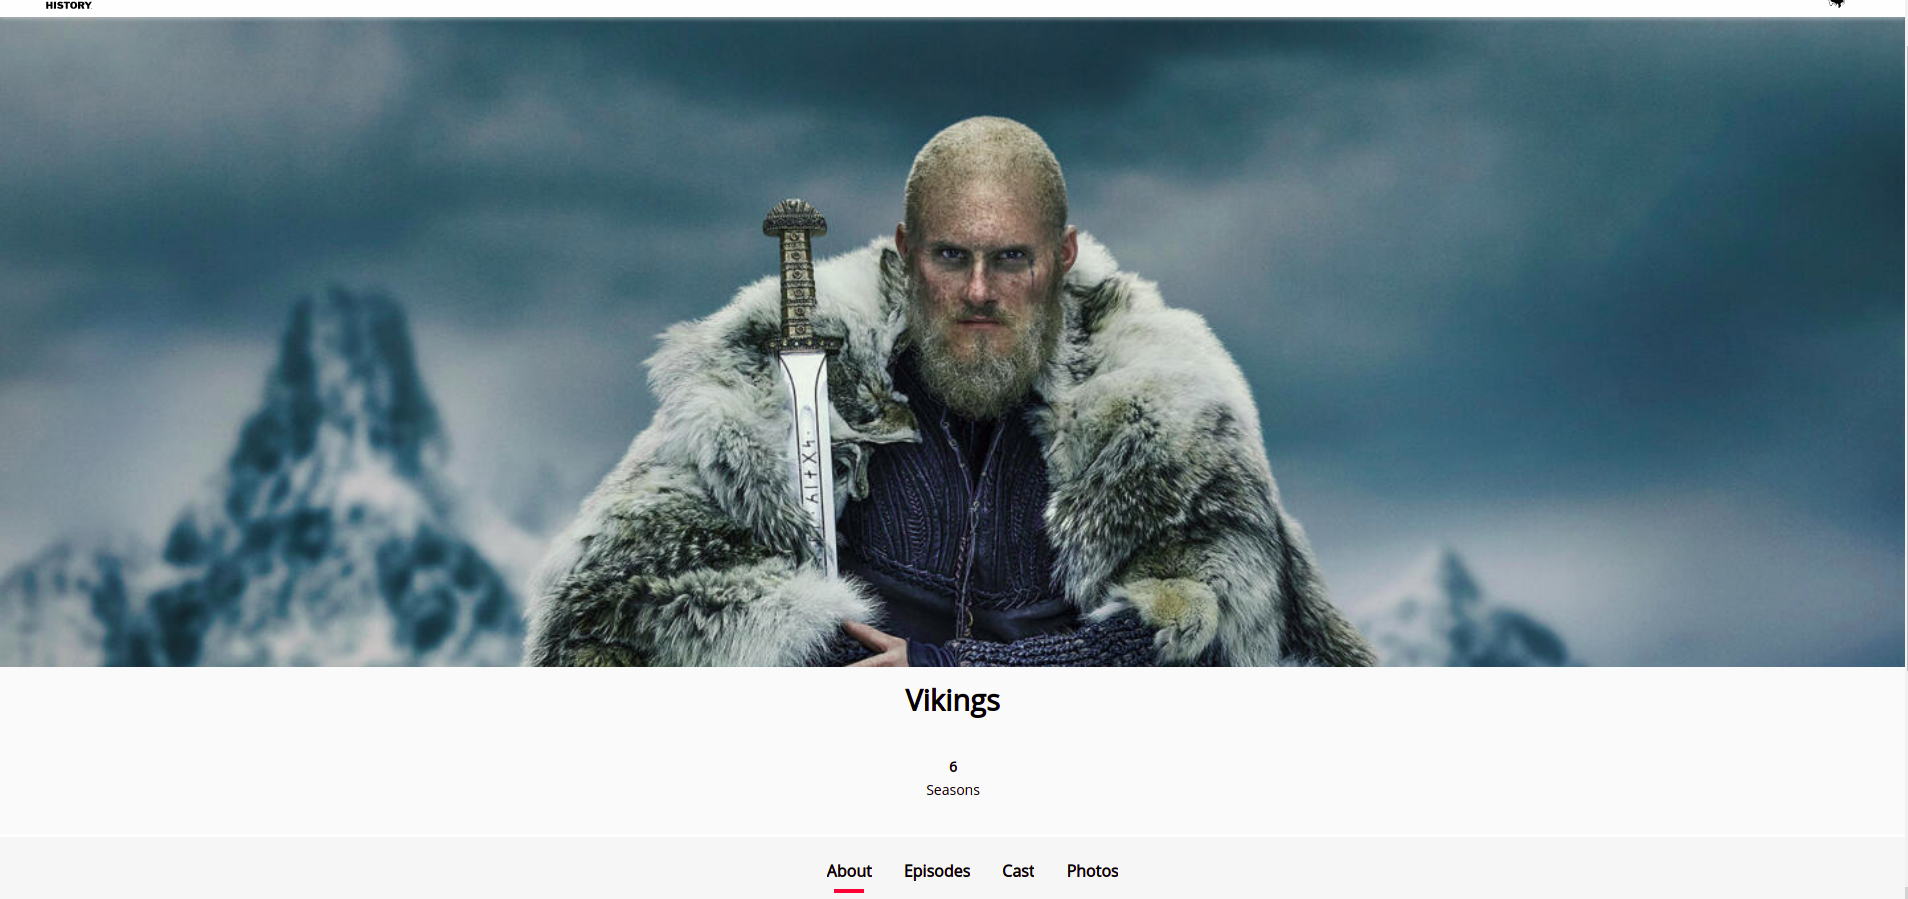 https://cloud-cez9caepc-hack-club-bot.vercel.app/0history_viking_01.png